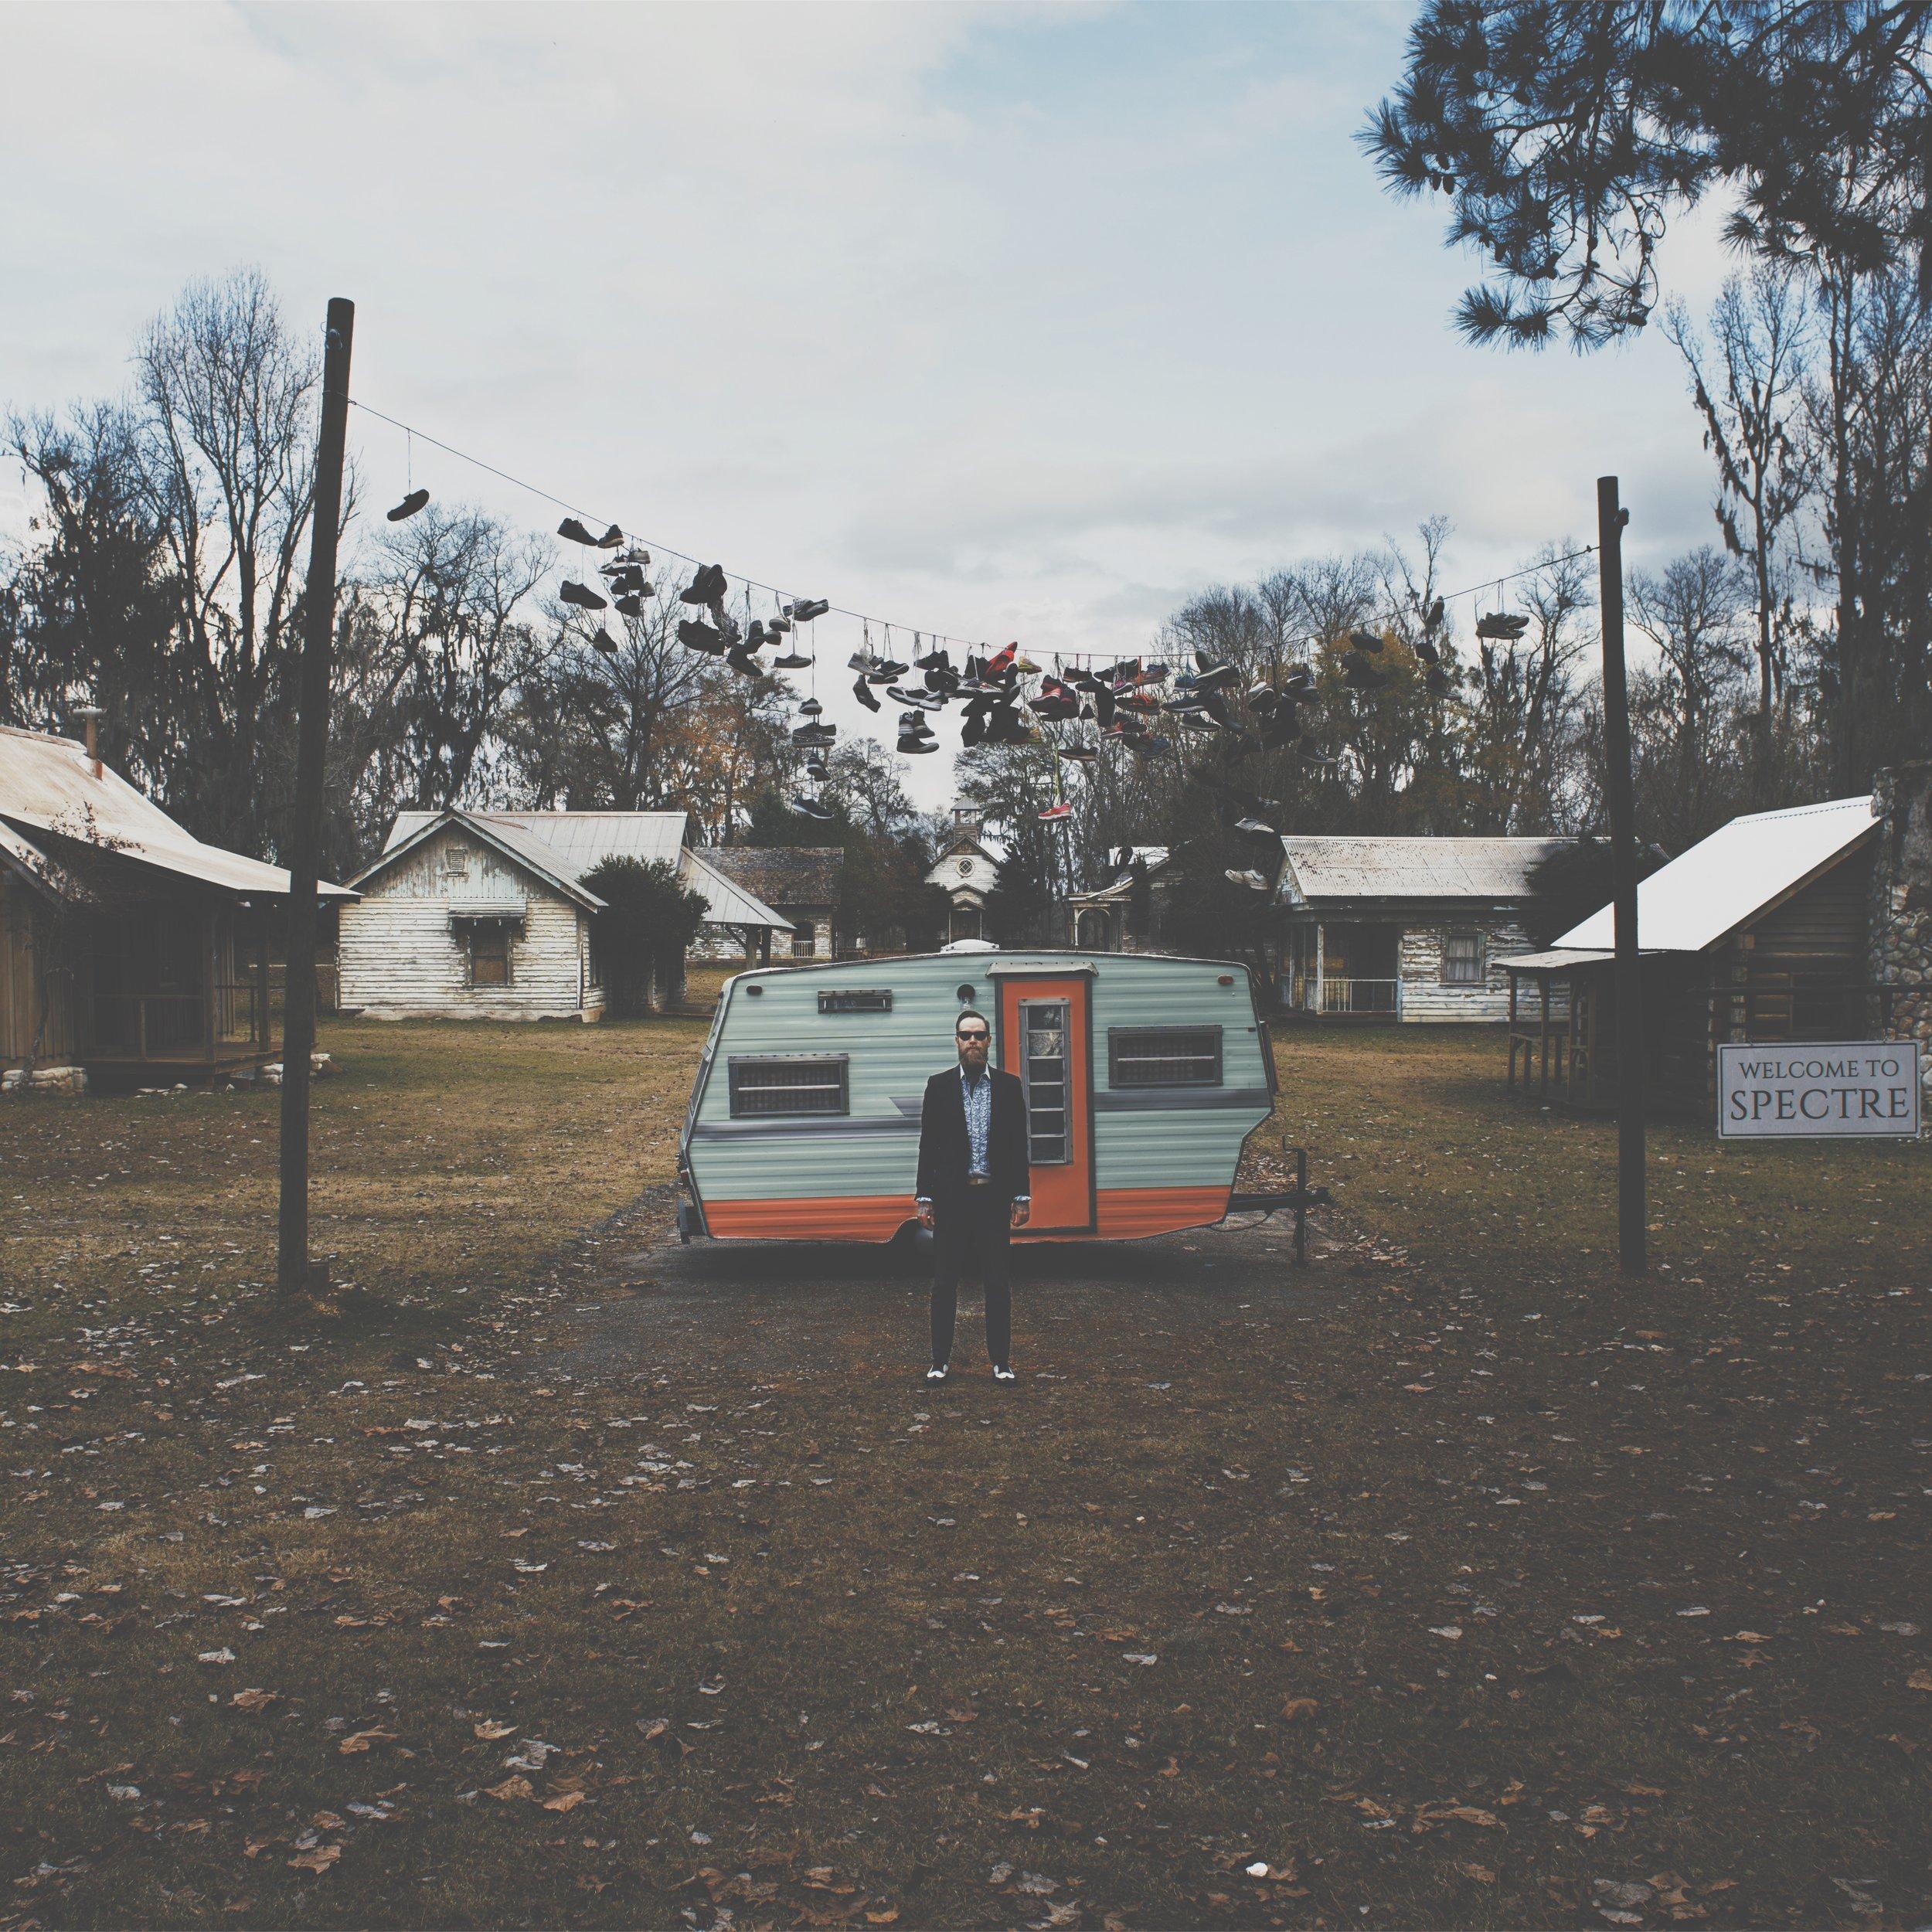 Tim Burton's town of Spectre aka Jackson Lake Island, Alabama